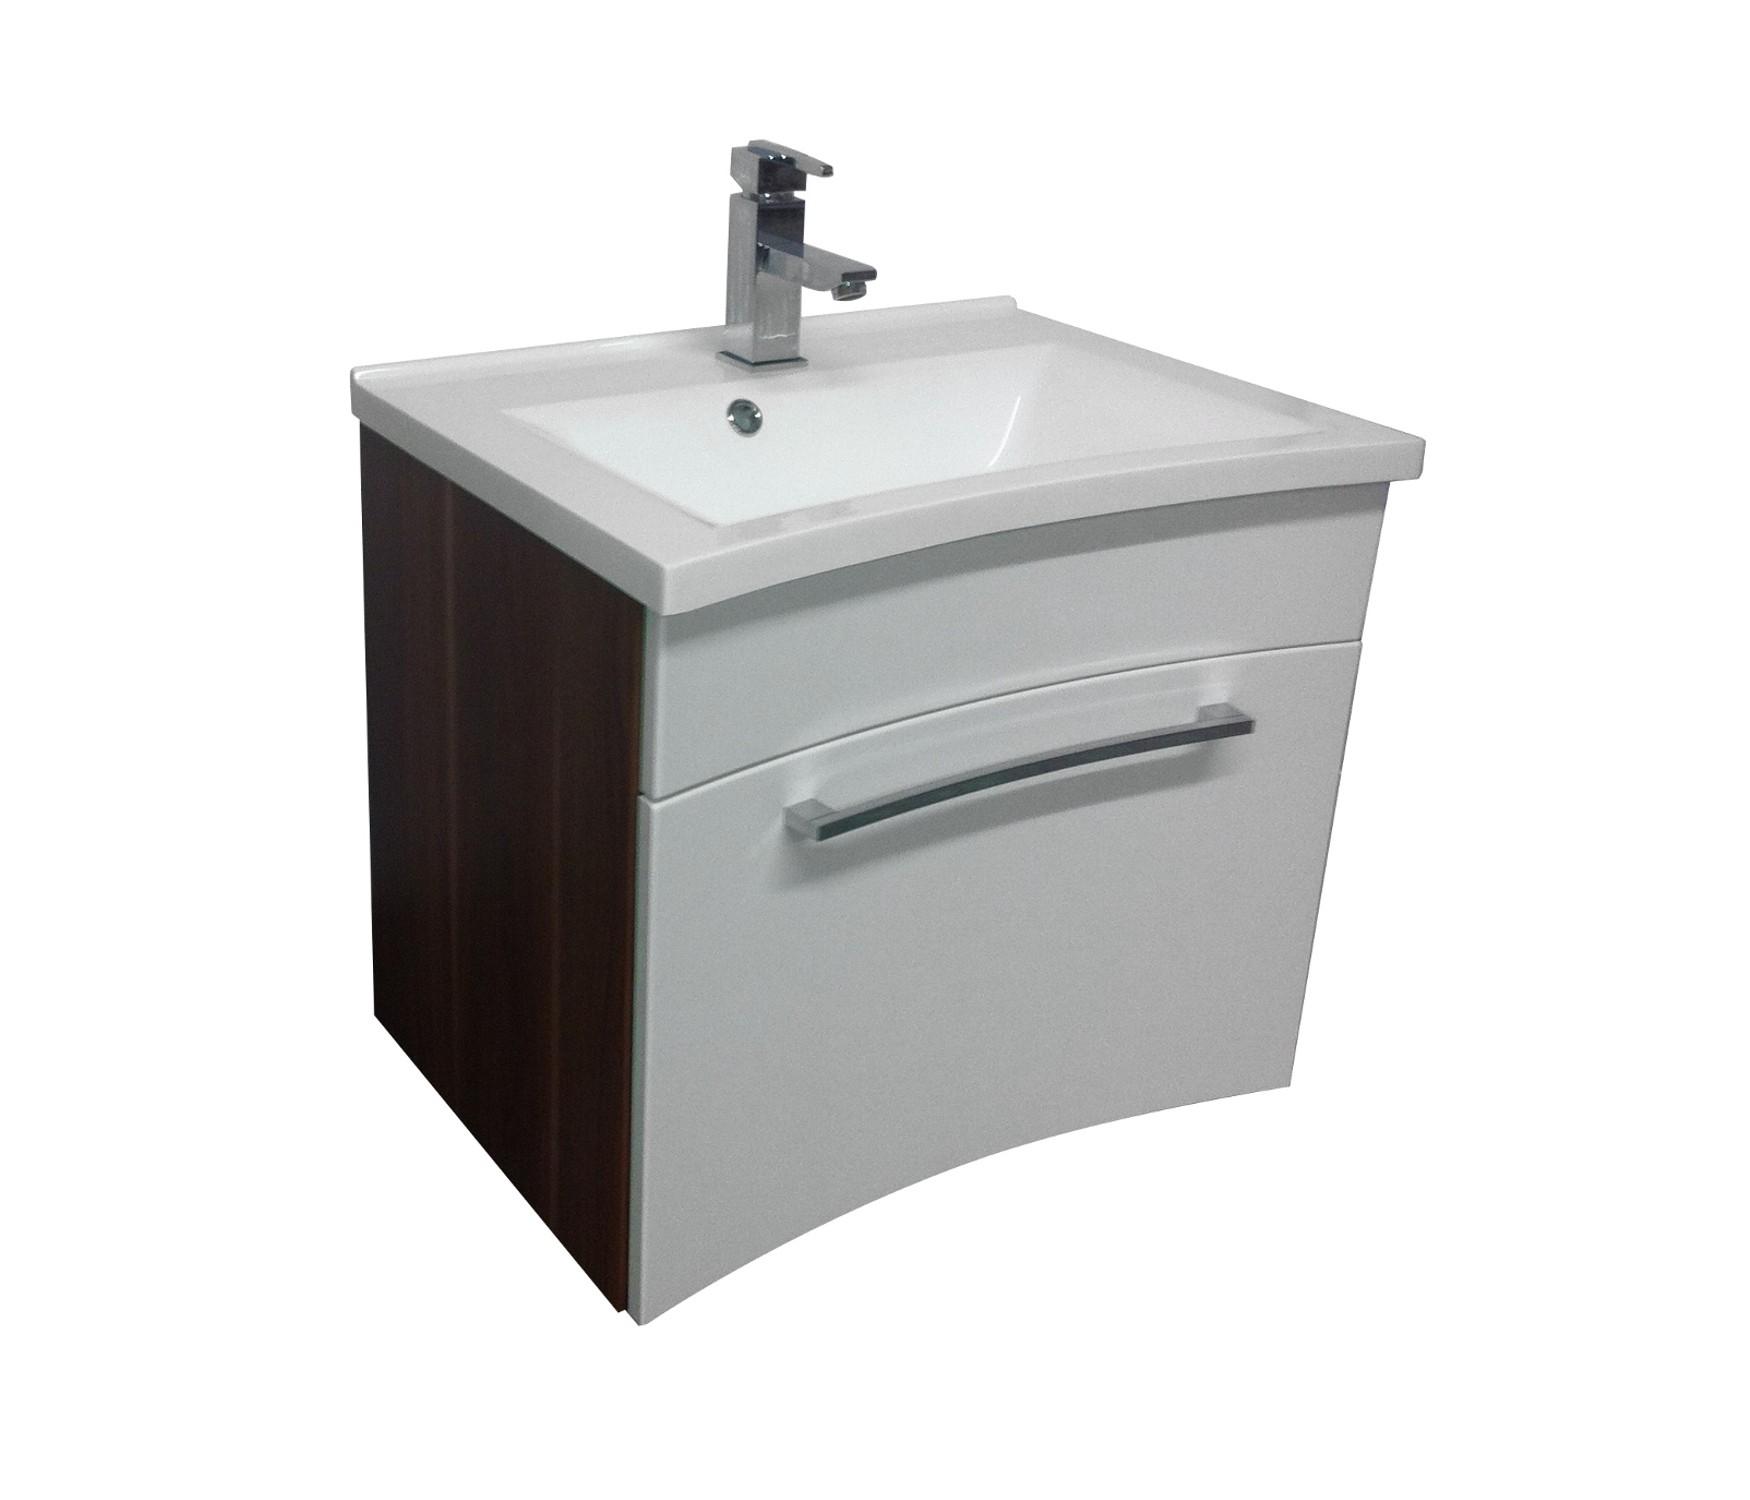 badm bel set laonda mit spiegelschrank 4 teilig 60 cm breit wei bad badm belsets. Black Bedroom Furniture Sets. Home Design Ideas